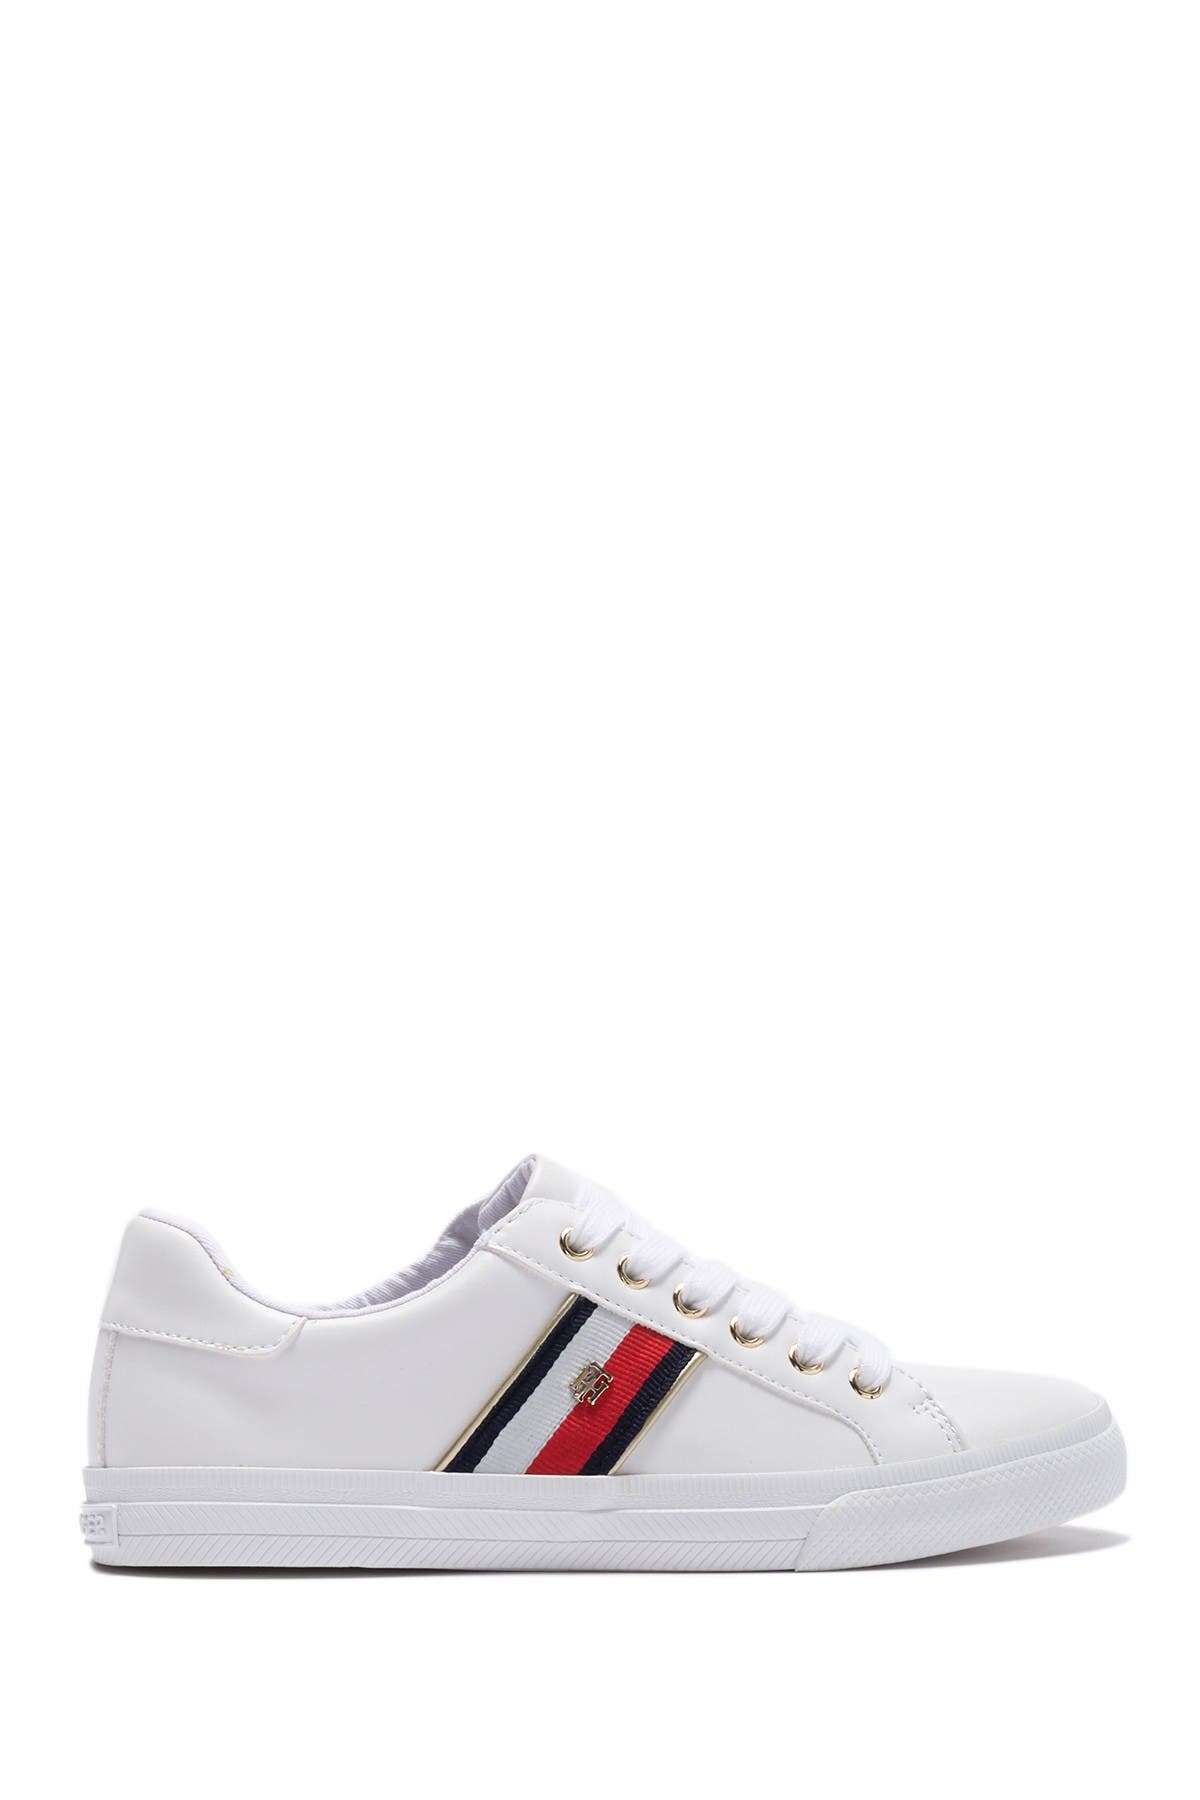 Tommy Hilfiger | Lenka Lace-Up Sneaker